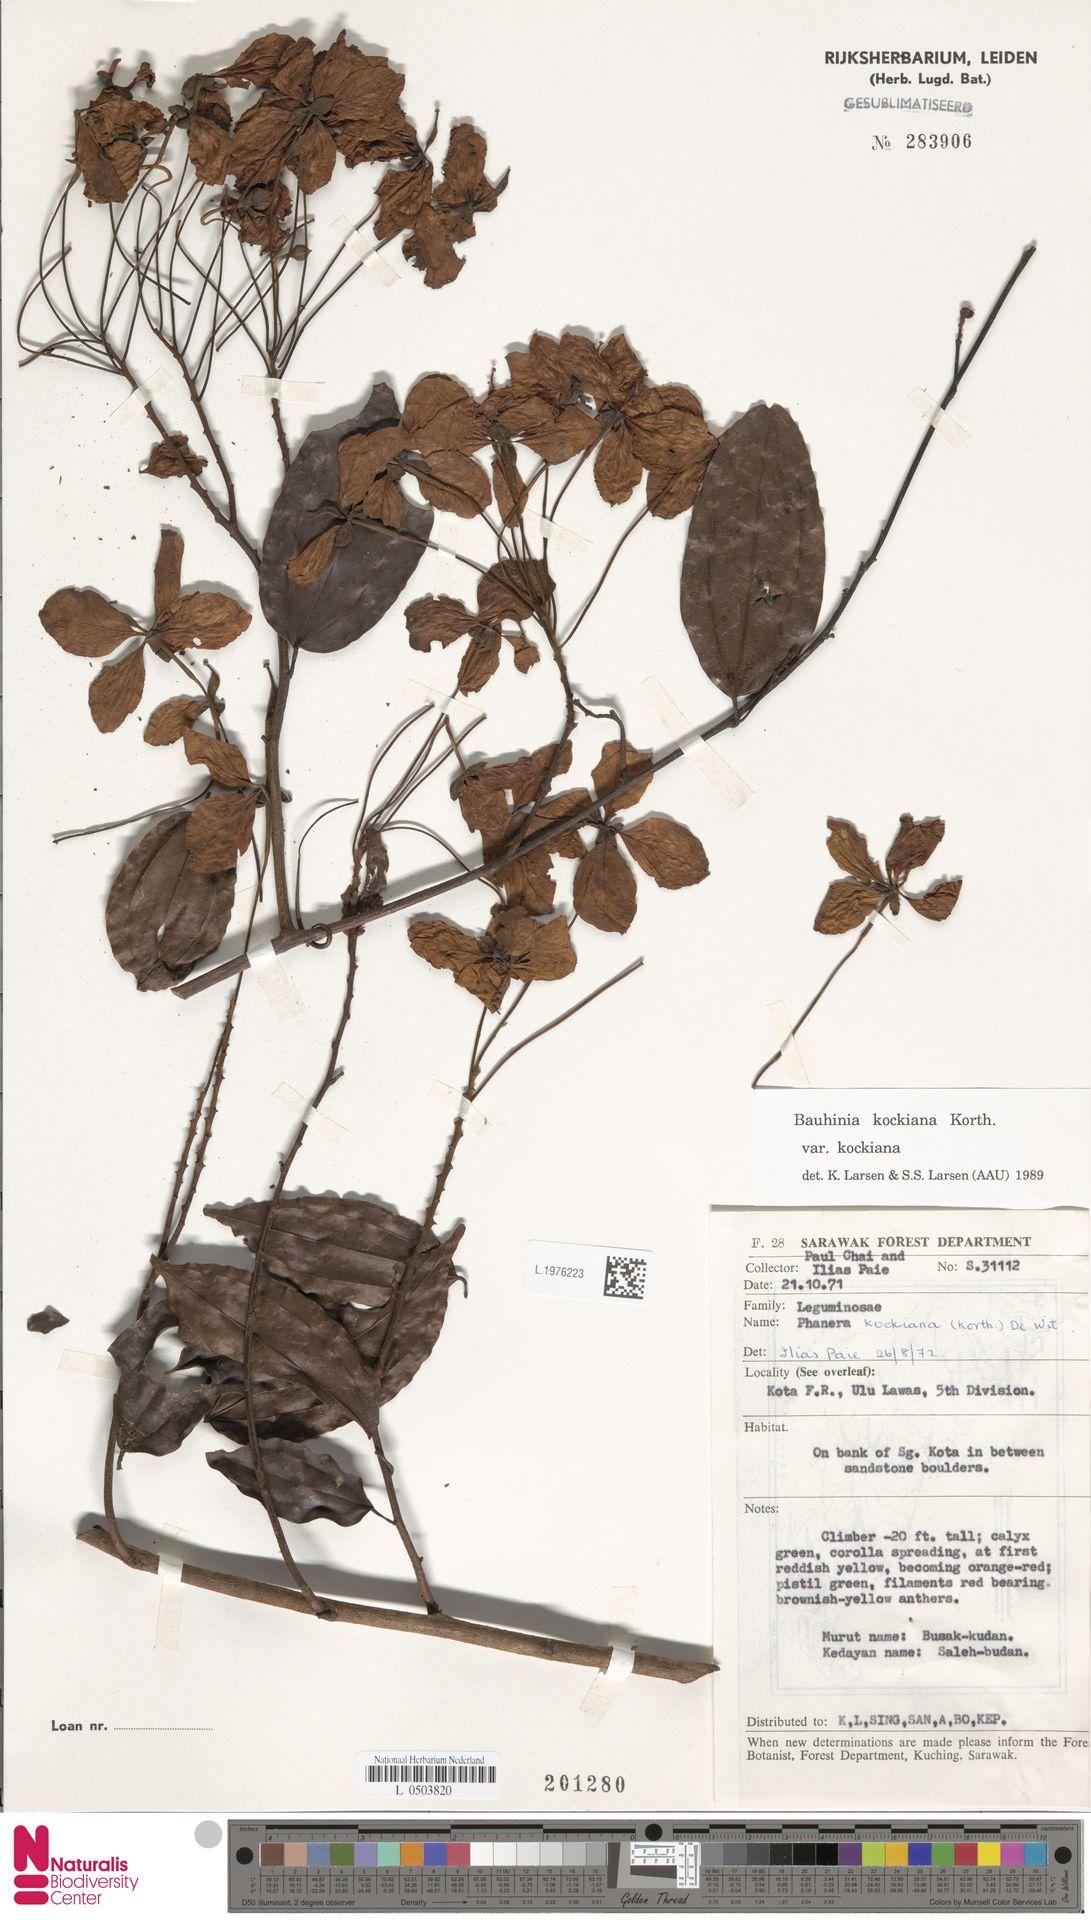 L.1976223 | Bauhinia kockiana var. kockiana